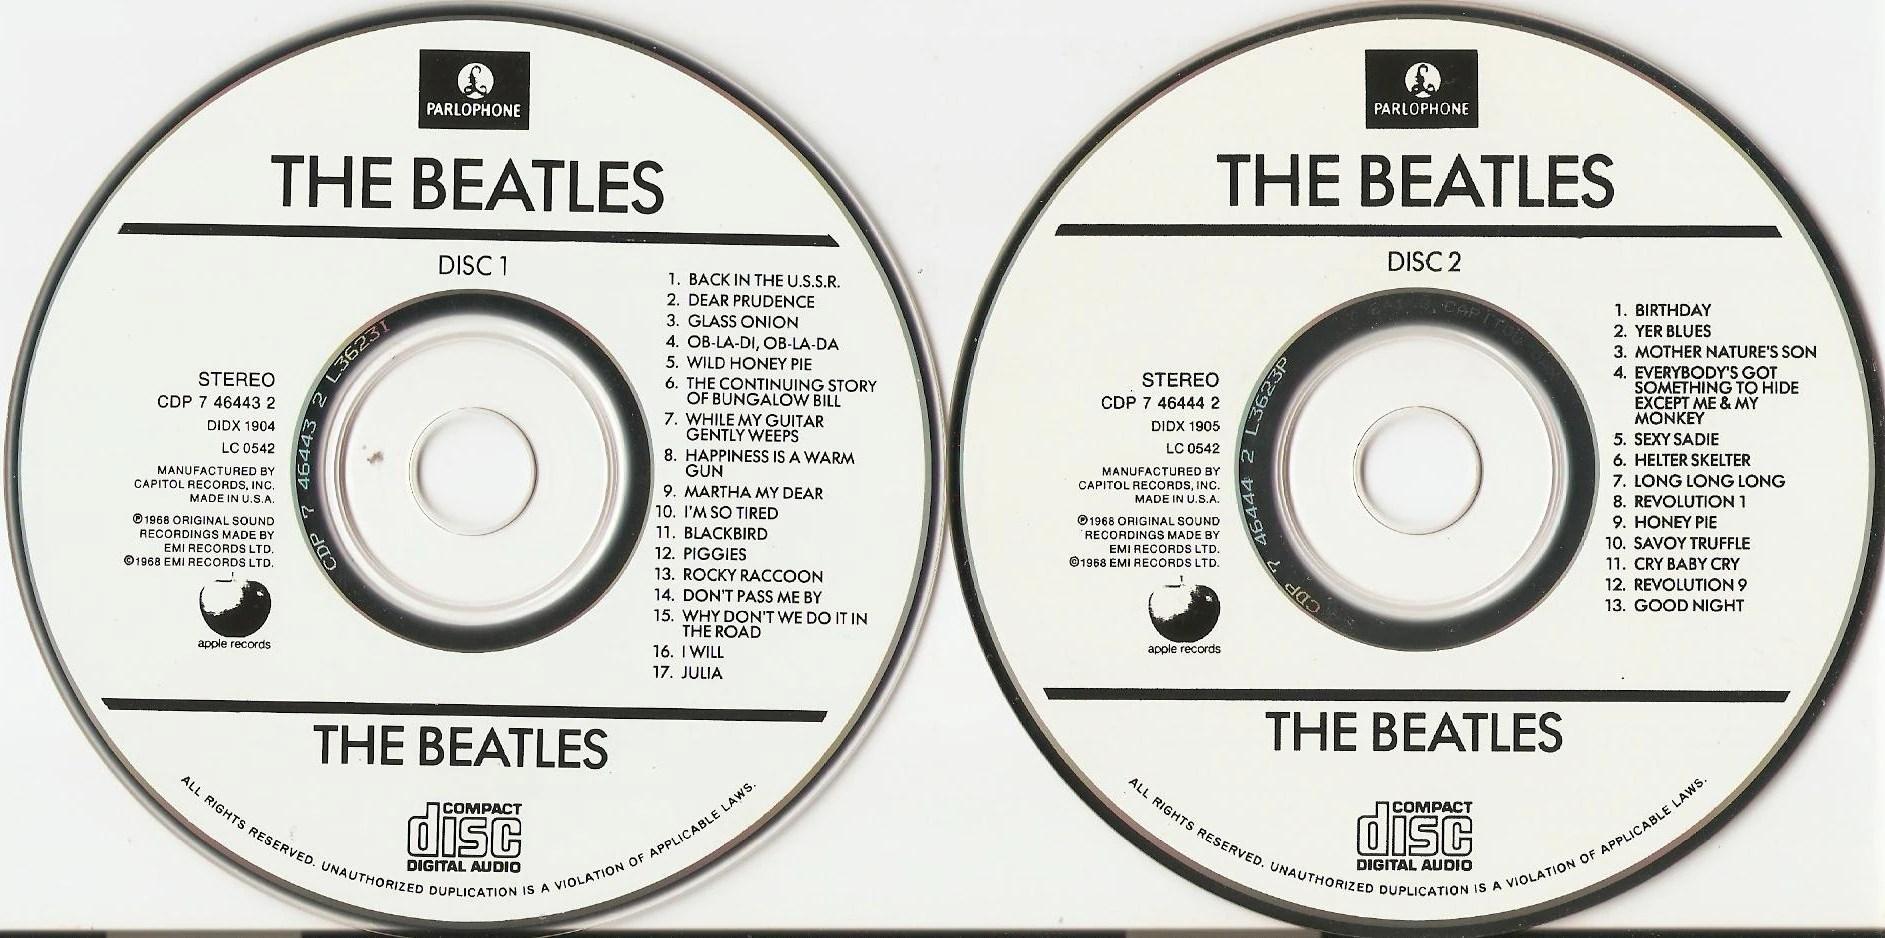 Beatles Abbey Road Cd Covers | Wiring Diagram Database